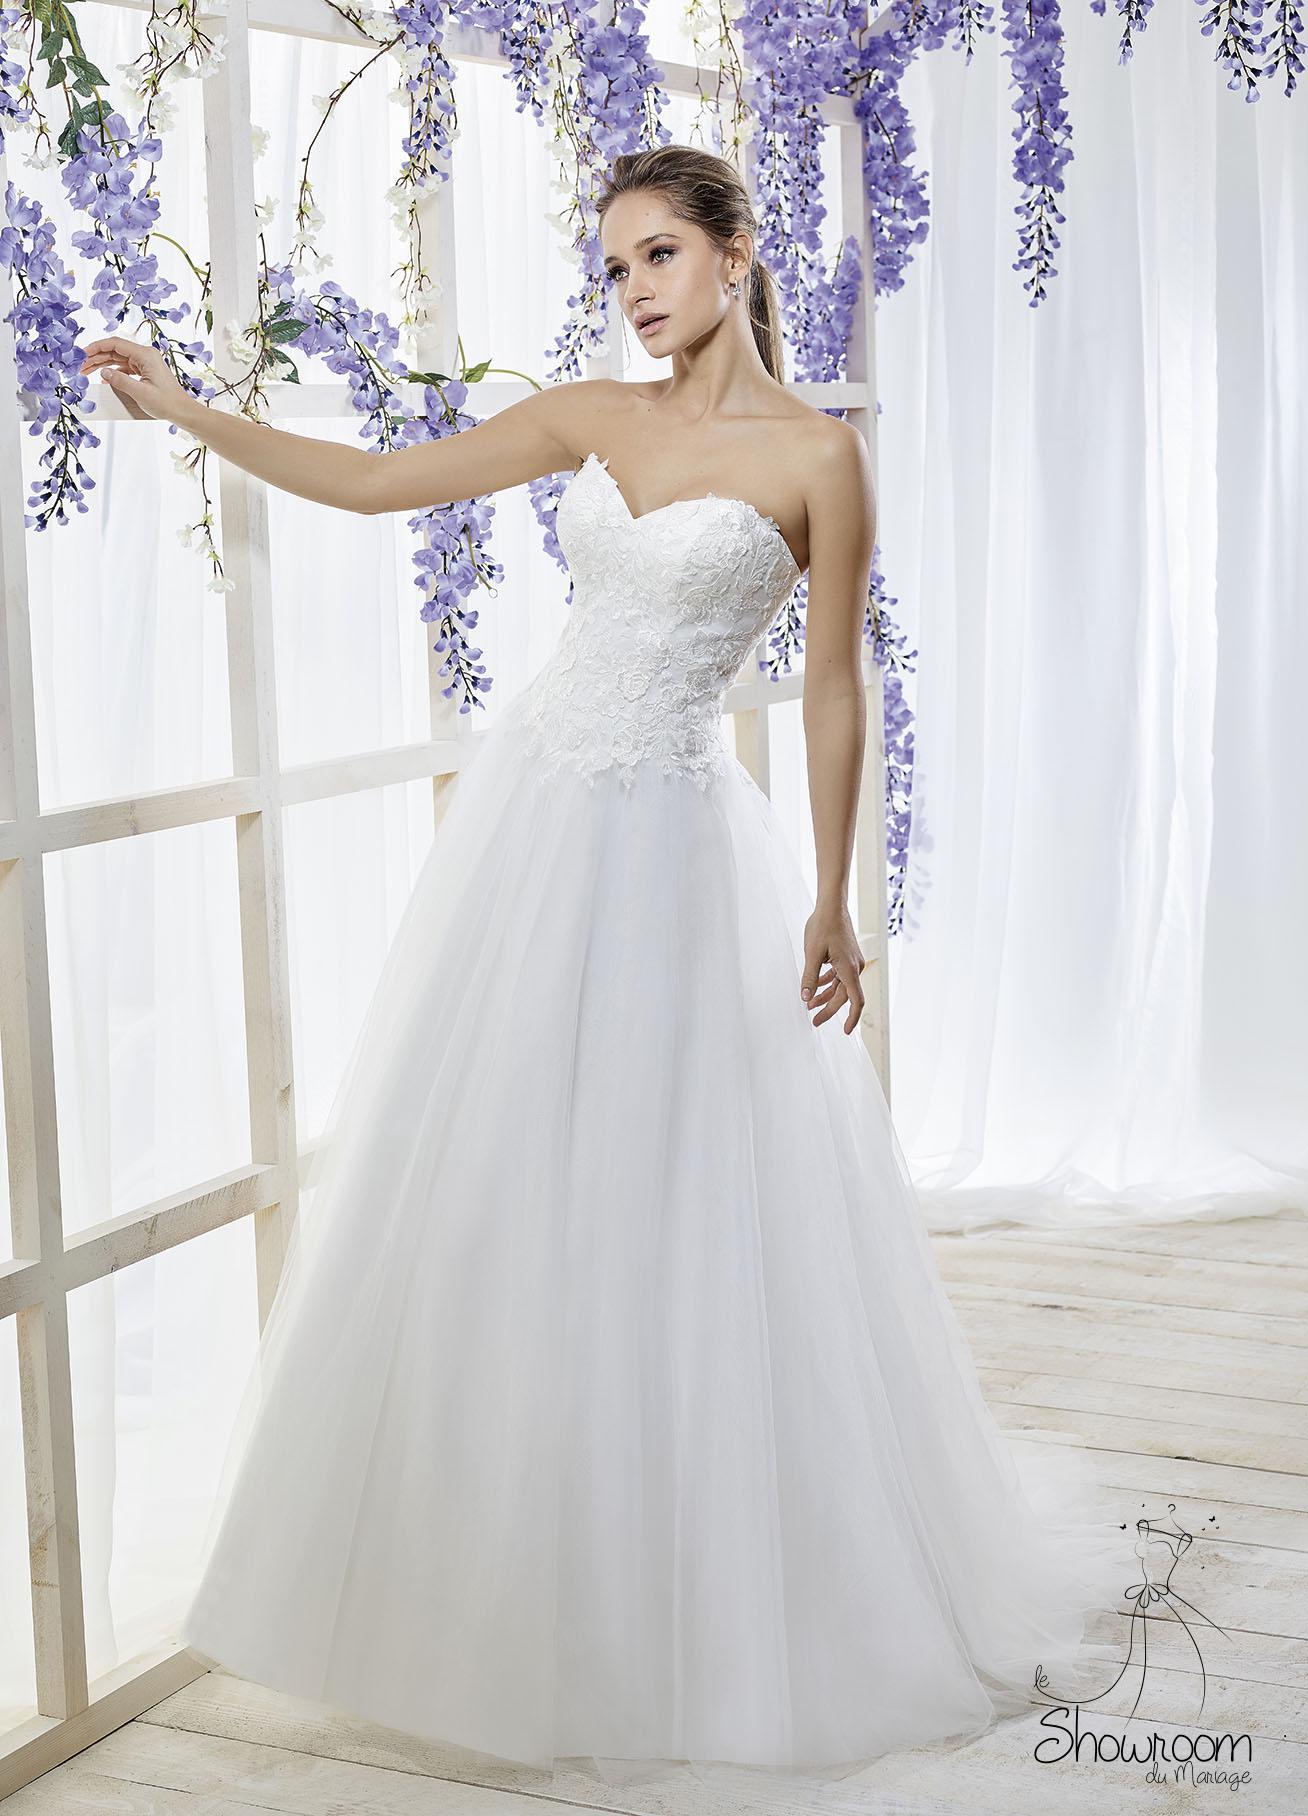 Robes de mariée 205-37